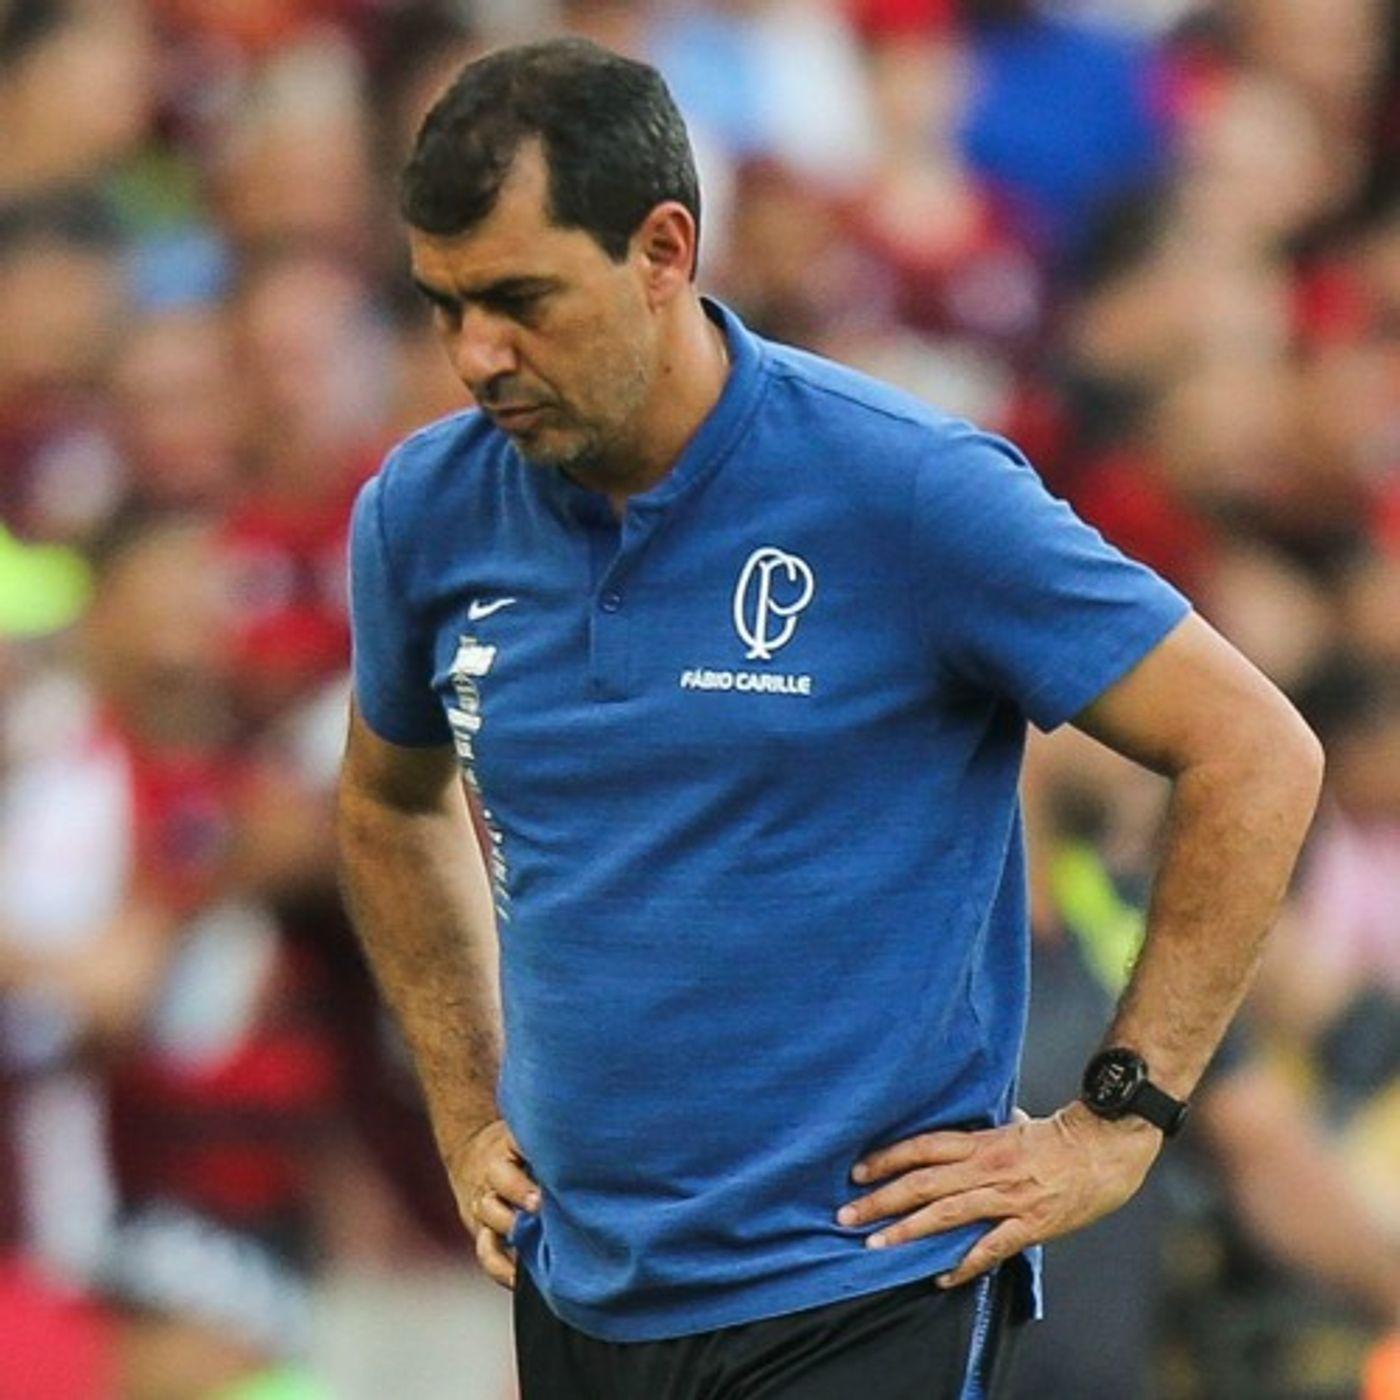 Corinthians terá mudança de rumo após queda de Carille?